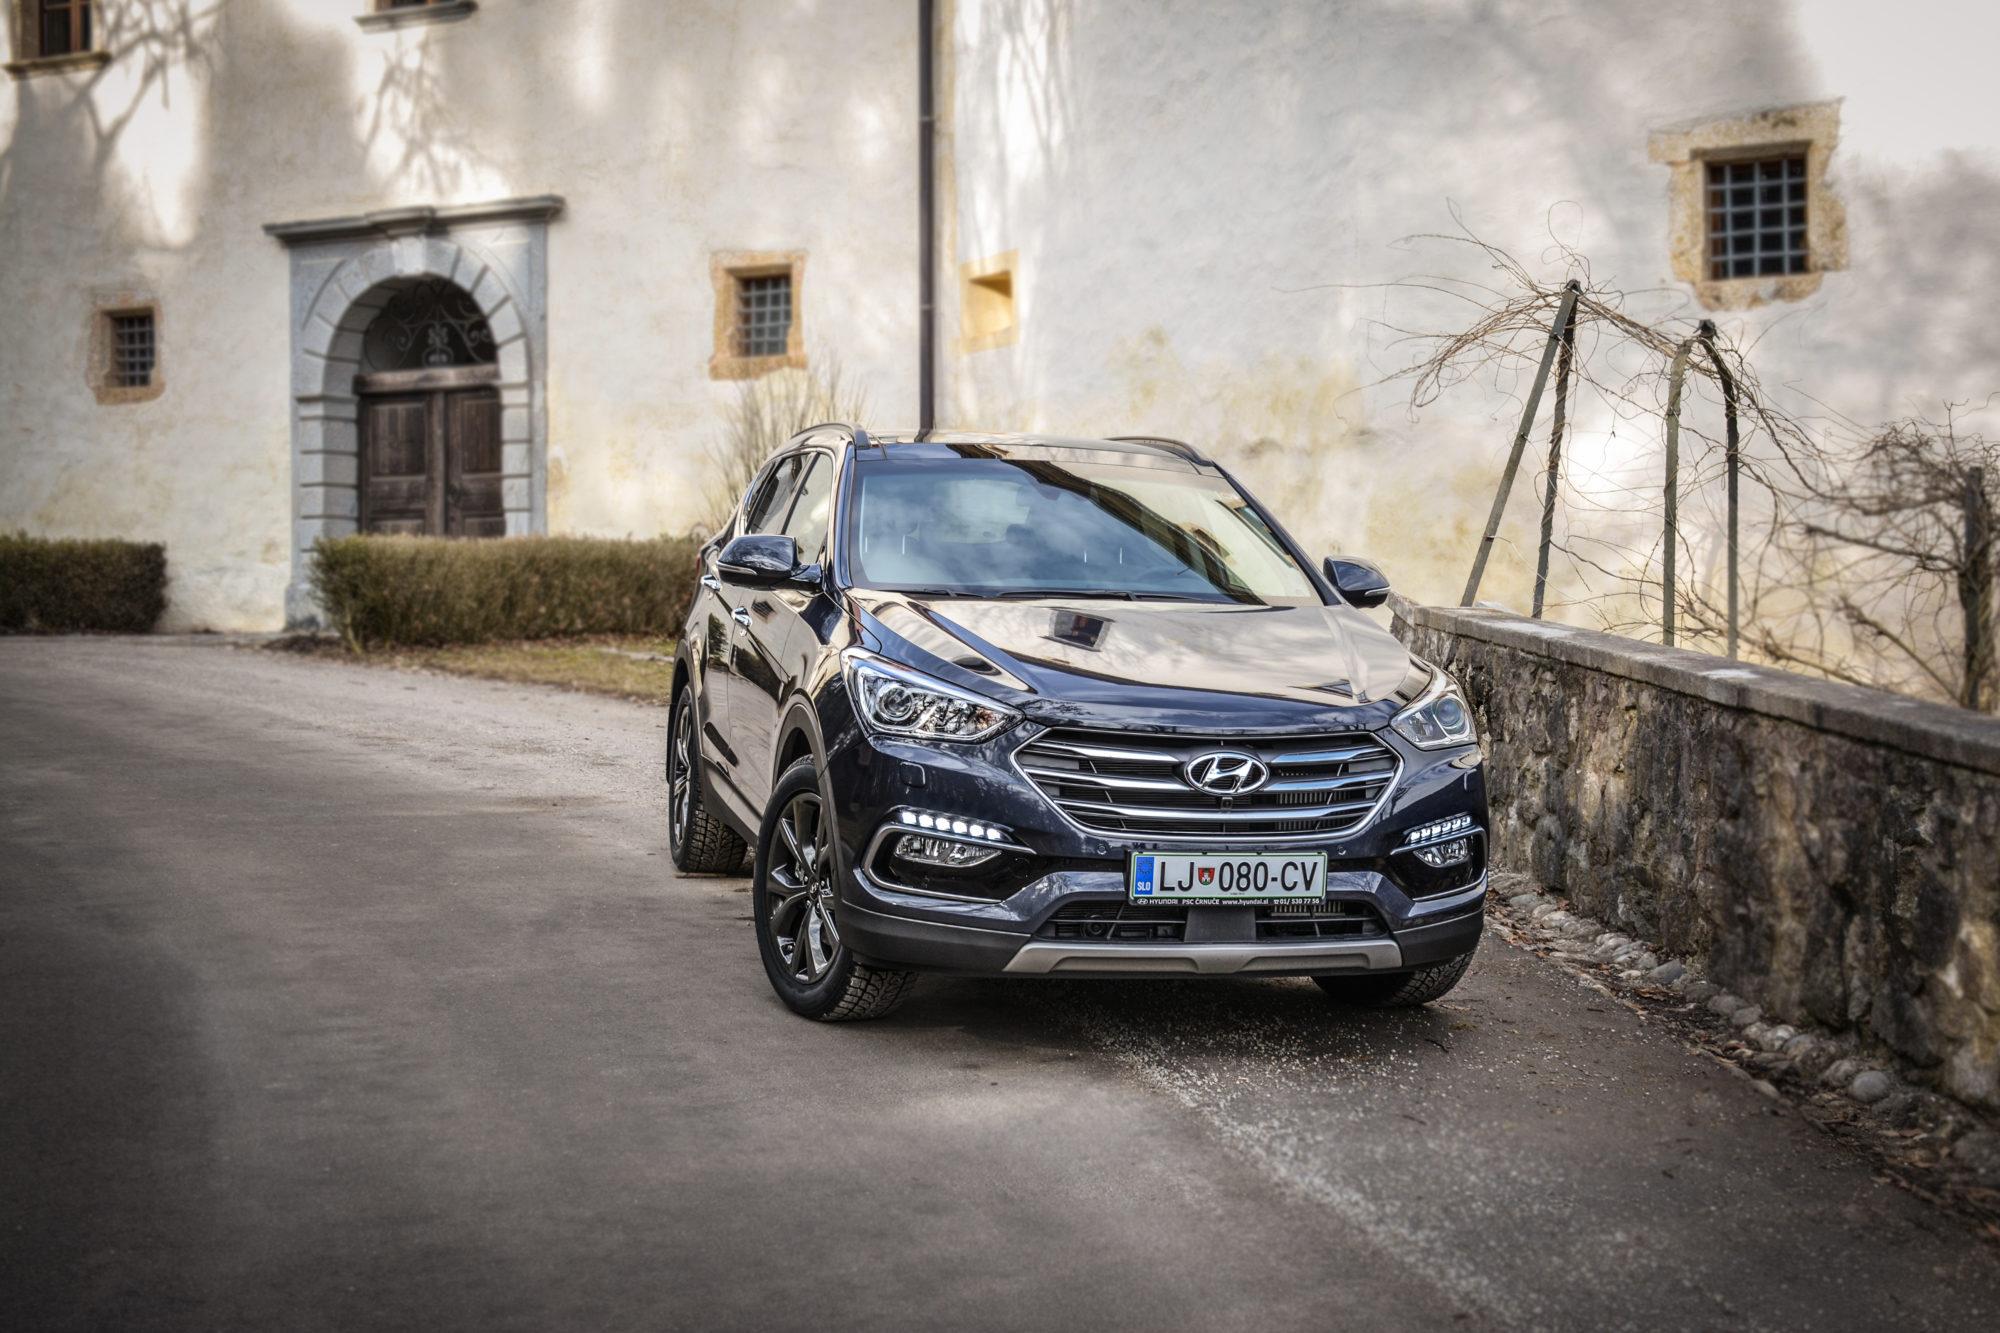 Test: Hyundai Santa Fe 2.2 CRDi 4WD (gospod SUV)